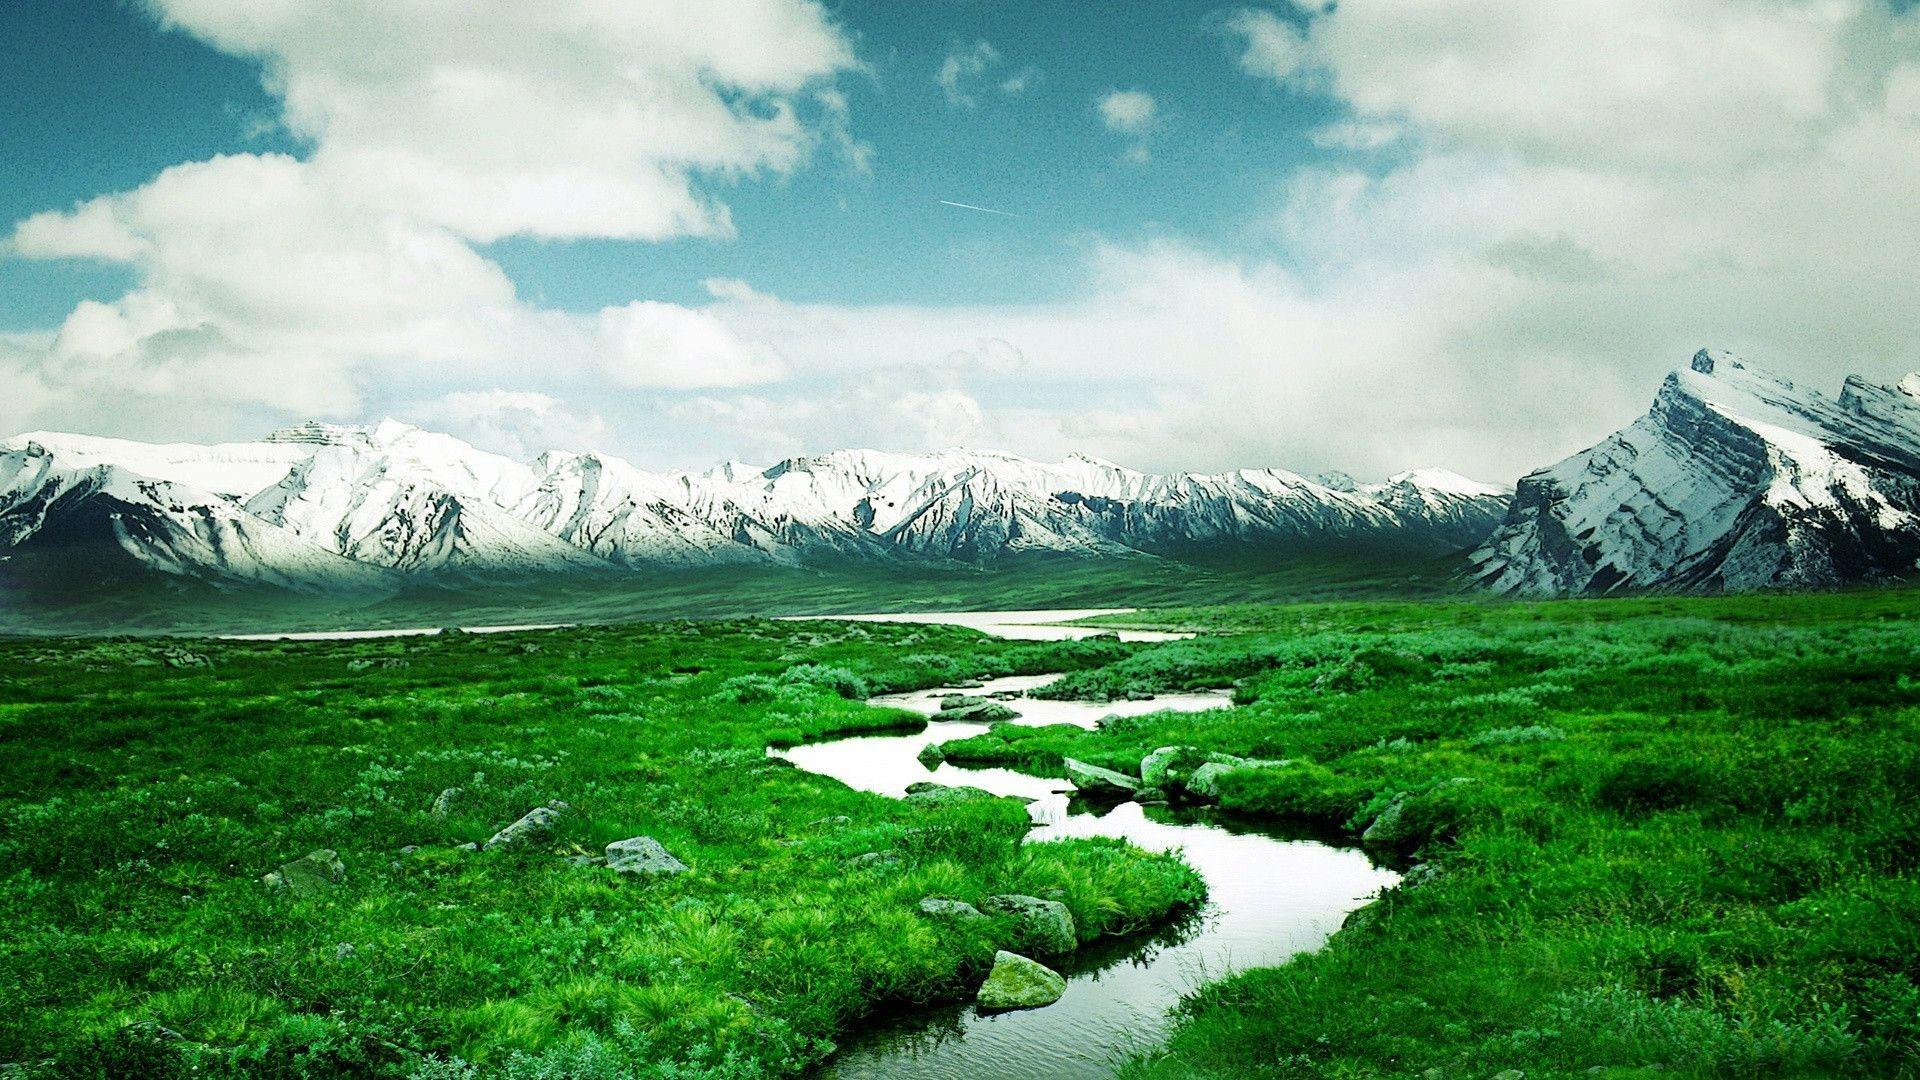 Free Download 1080p Nature Wallpaper Download Hd Desktop